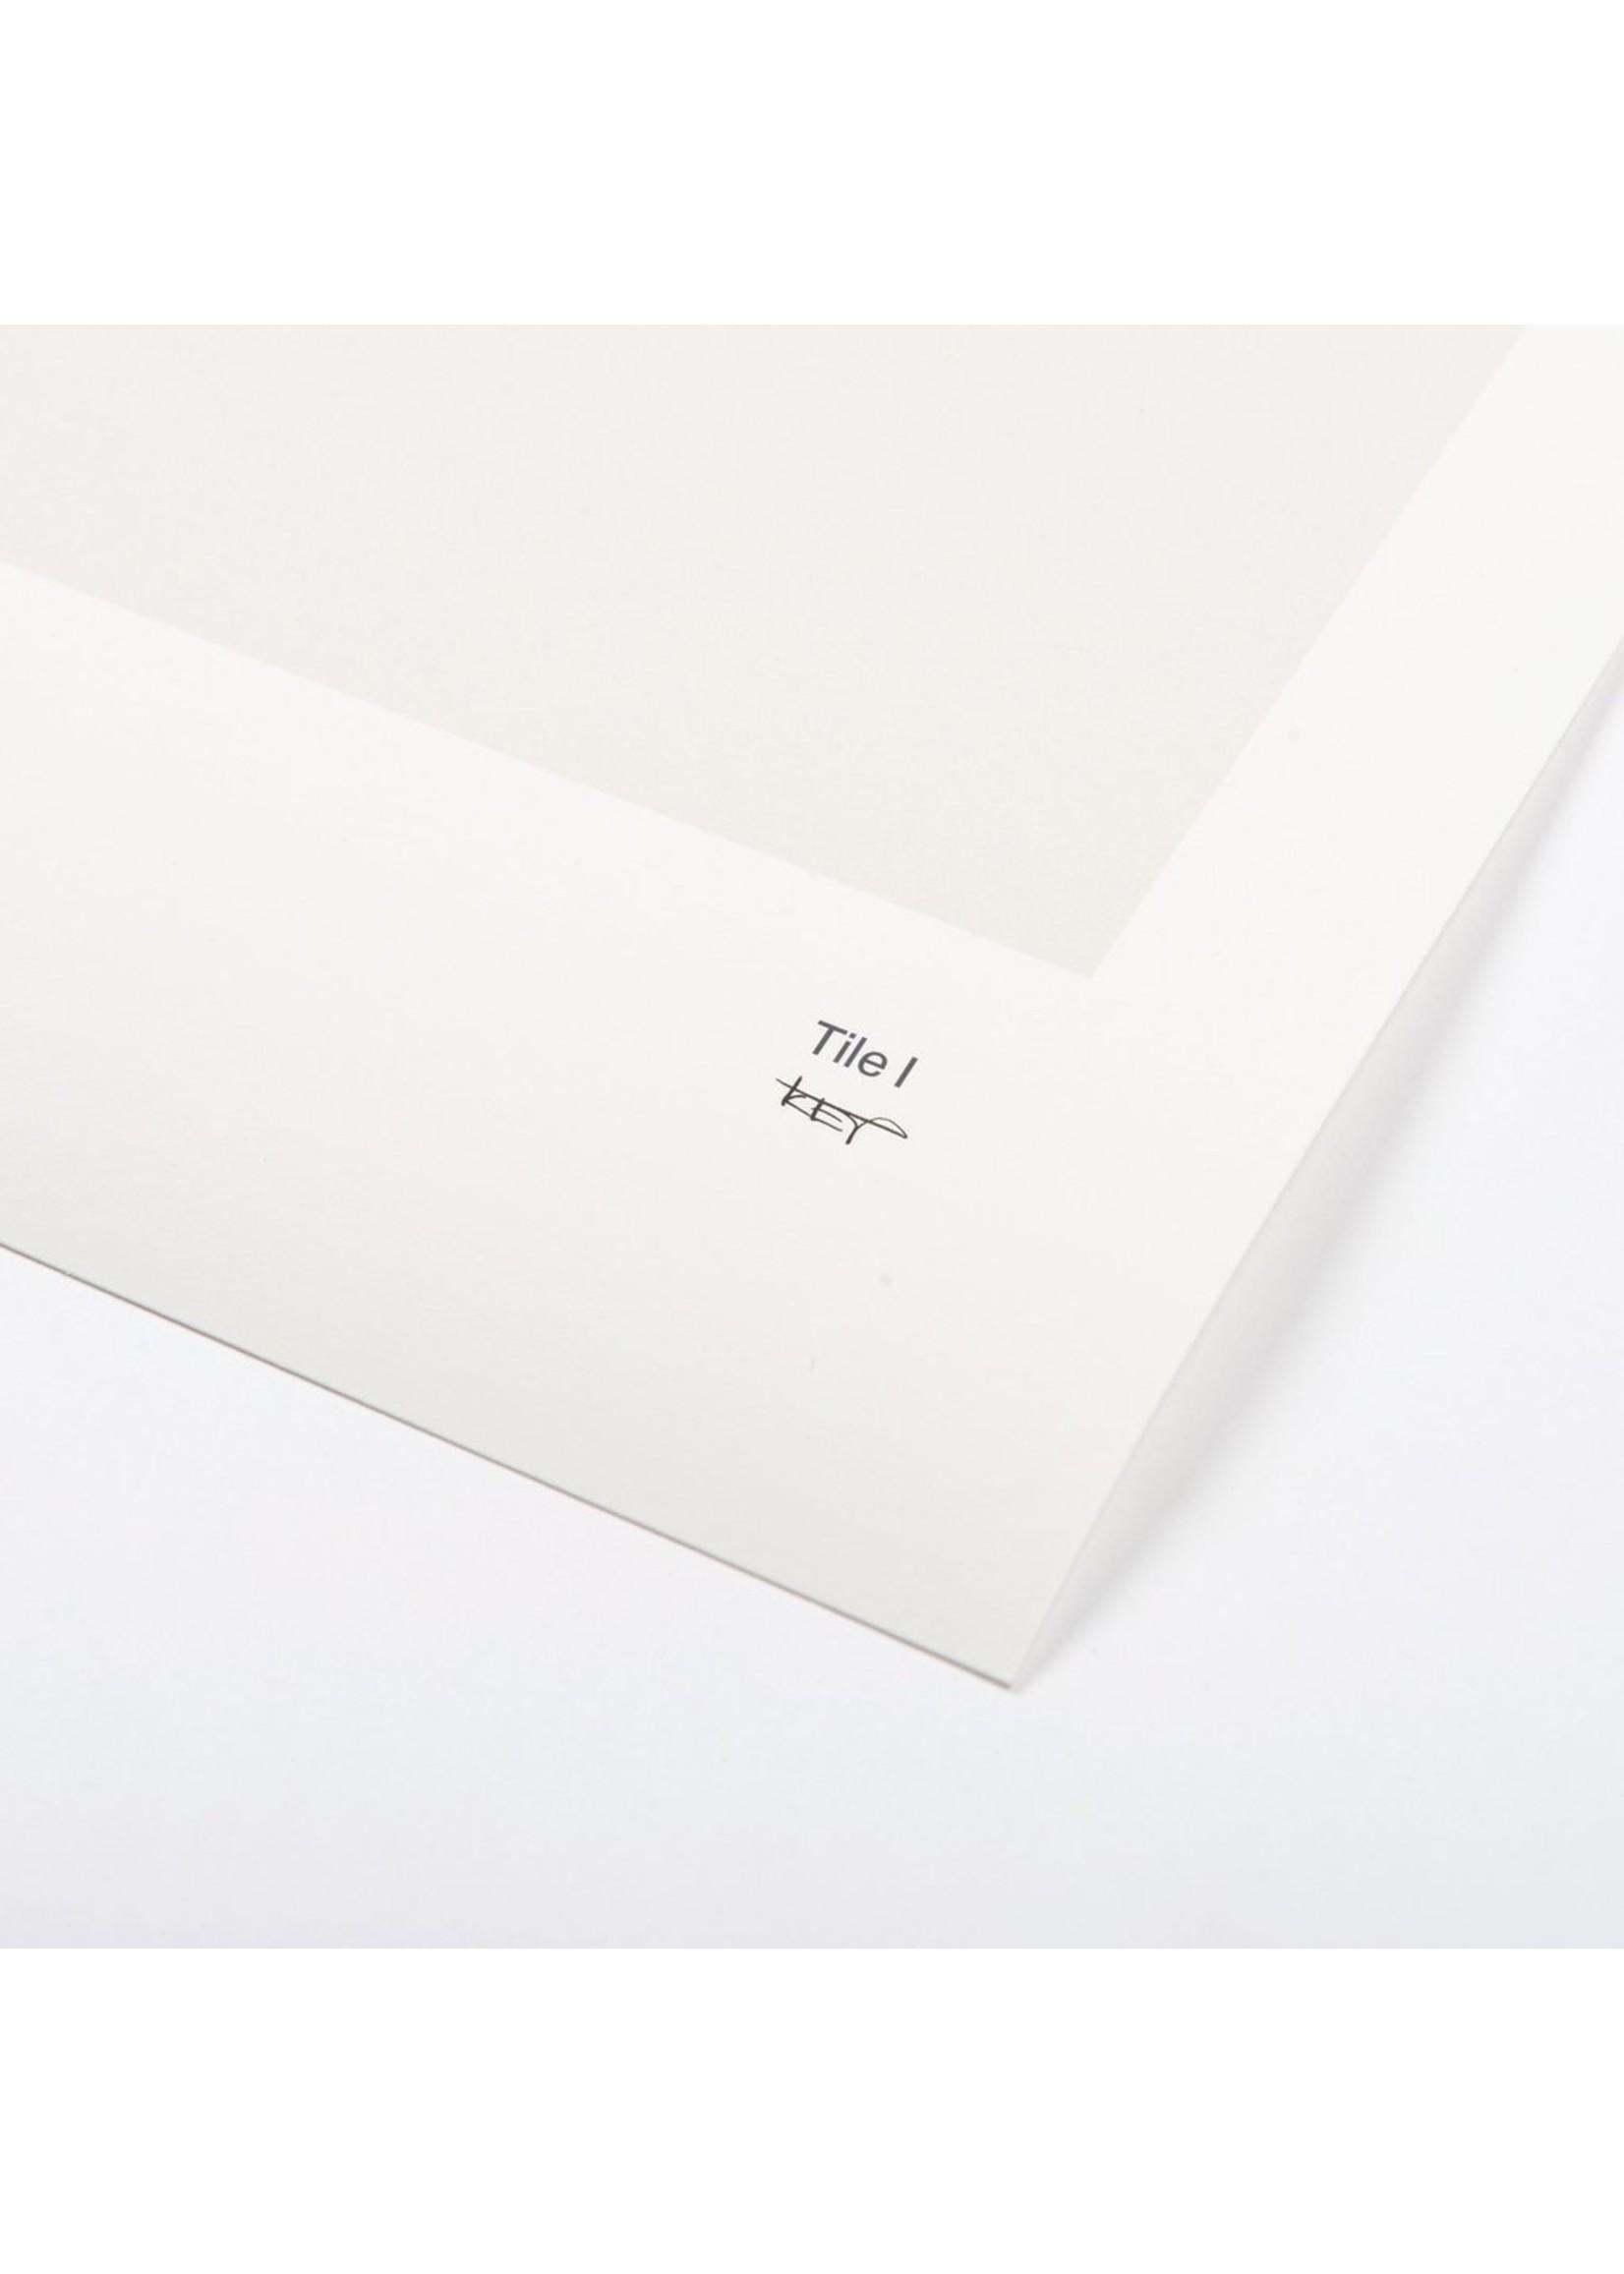 Tom Pigeon Tom Pigeon Tile 1 Print - A3